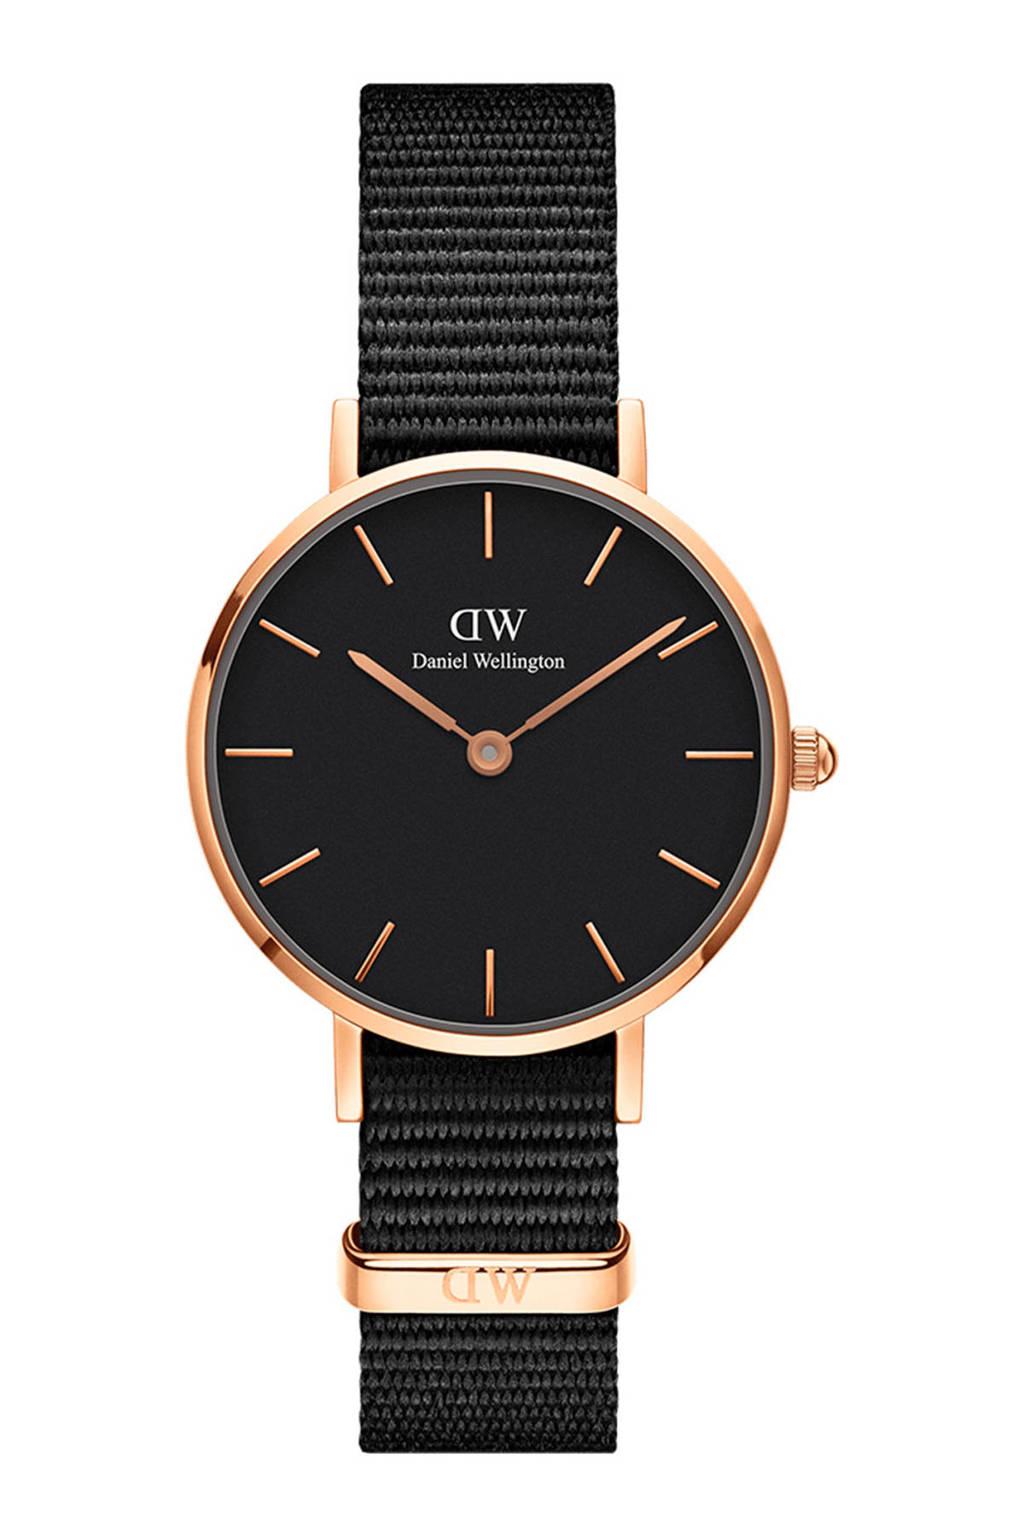 Daniel Wellington horloge - DW00100247, Zwart